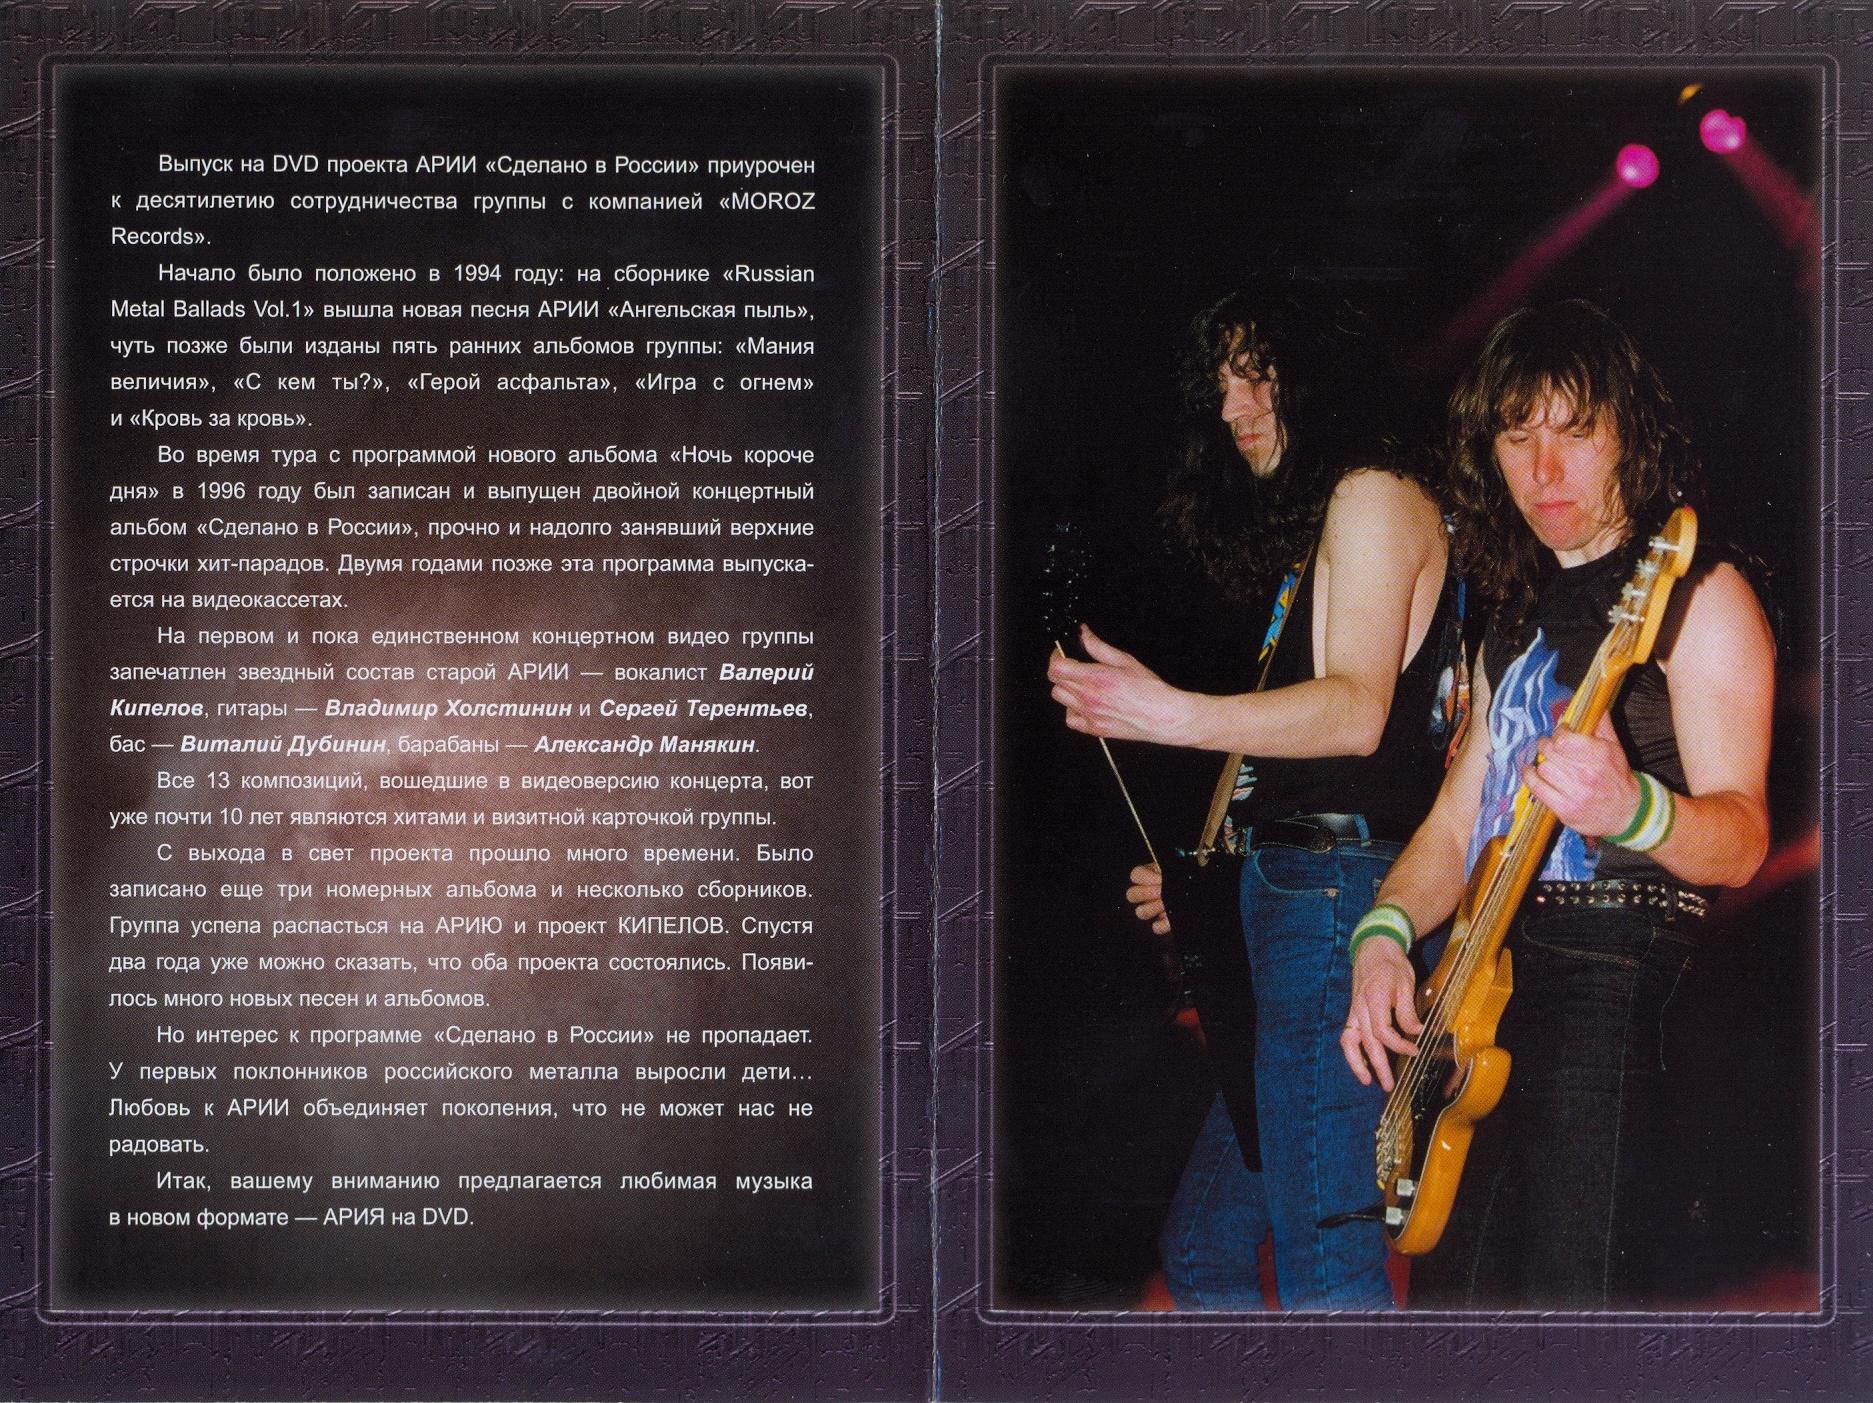 Исполнитель: aerosmith альбом: nine lives жанр: hard rock год: 1997 размер архива: 157mb формат: mр3-320